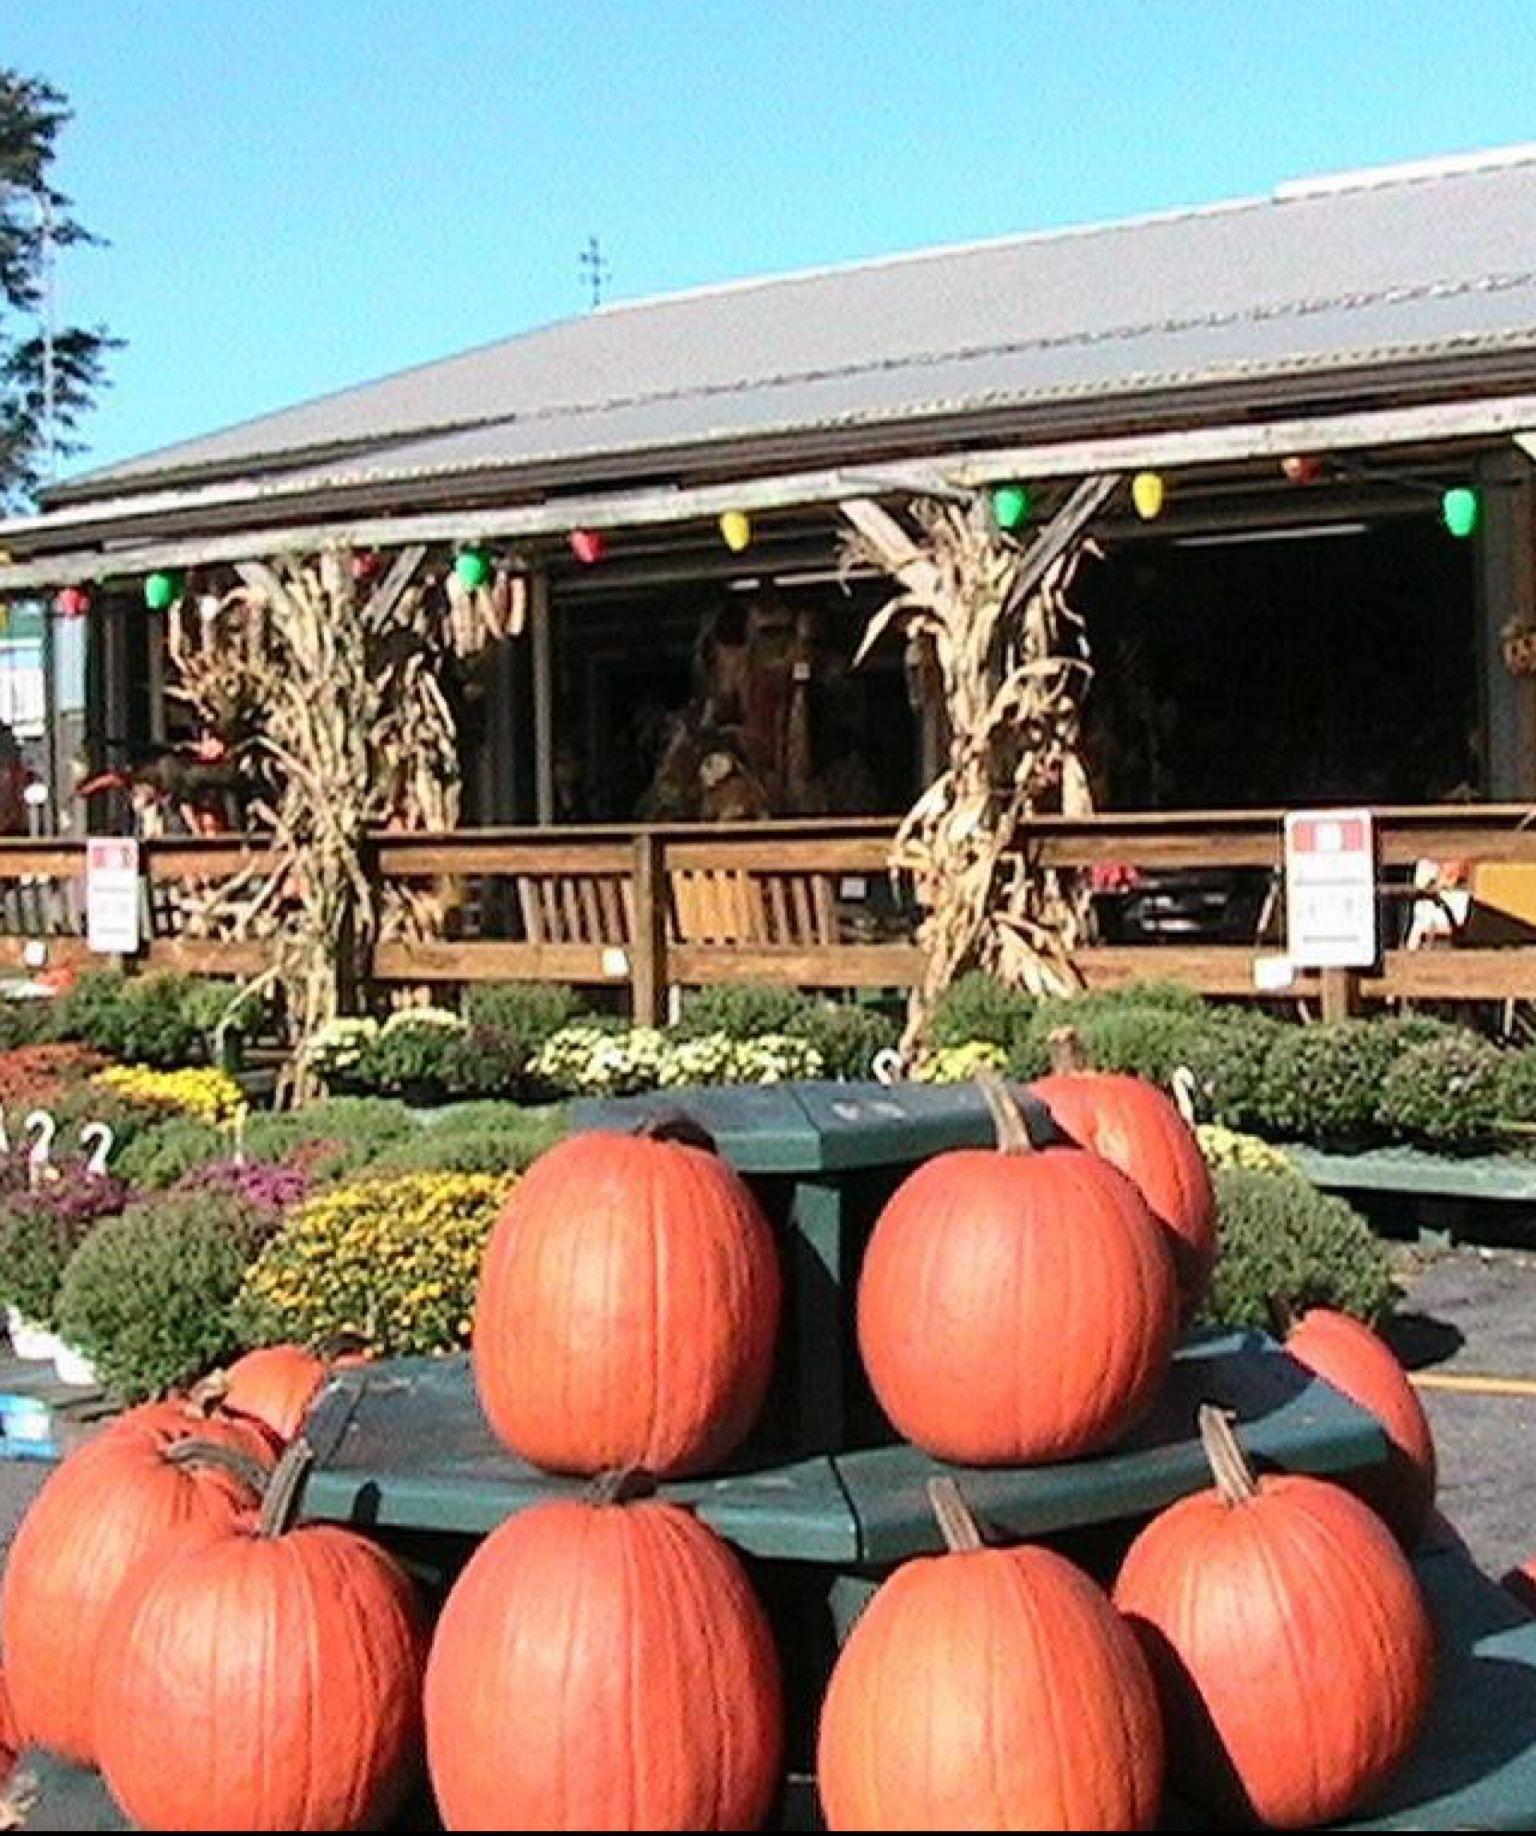 Sycamore Spring Orchard - Jonestown, PA #Yuggler #KidsActivities #Farm